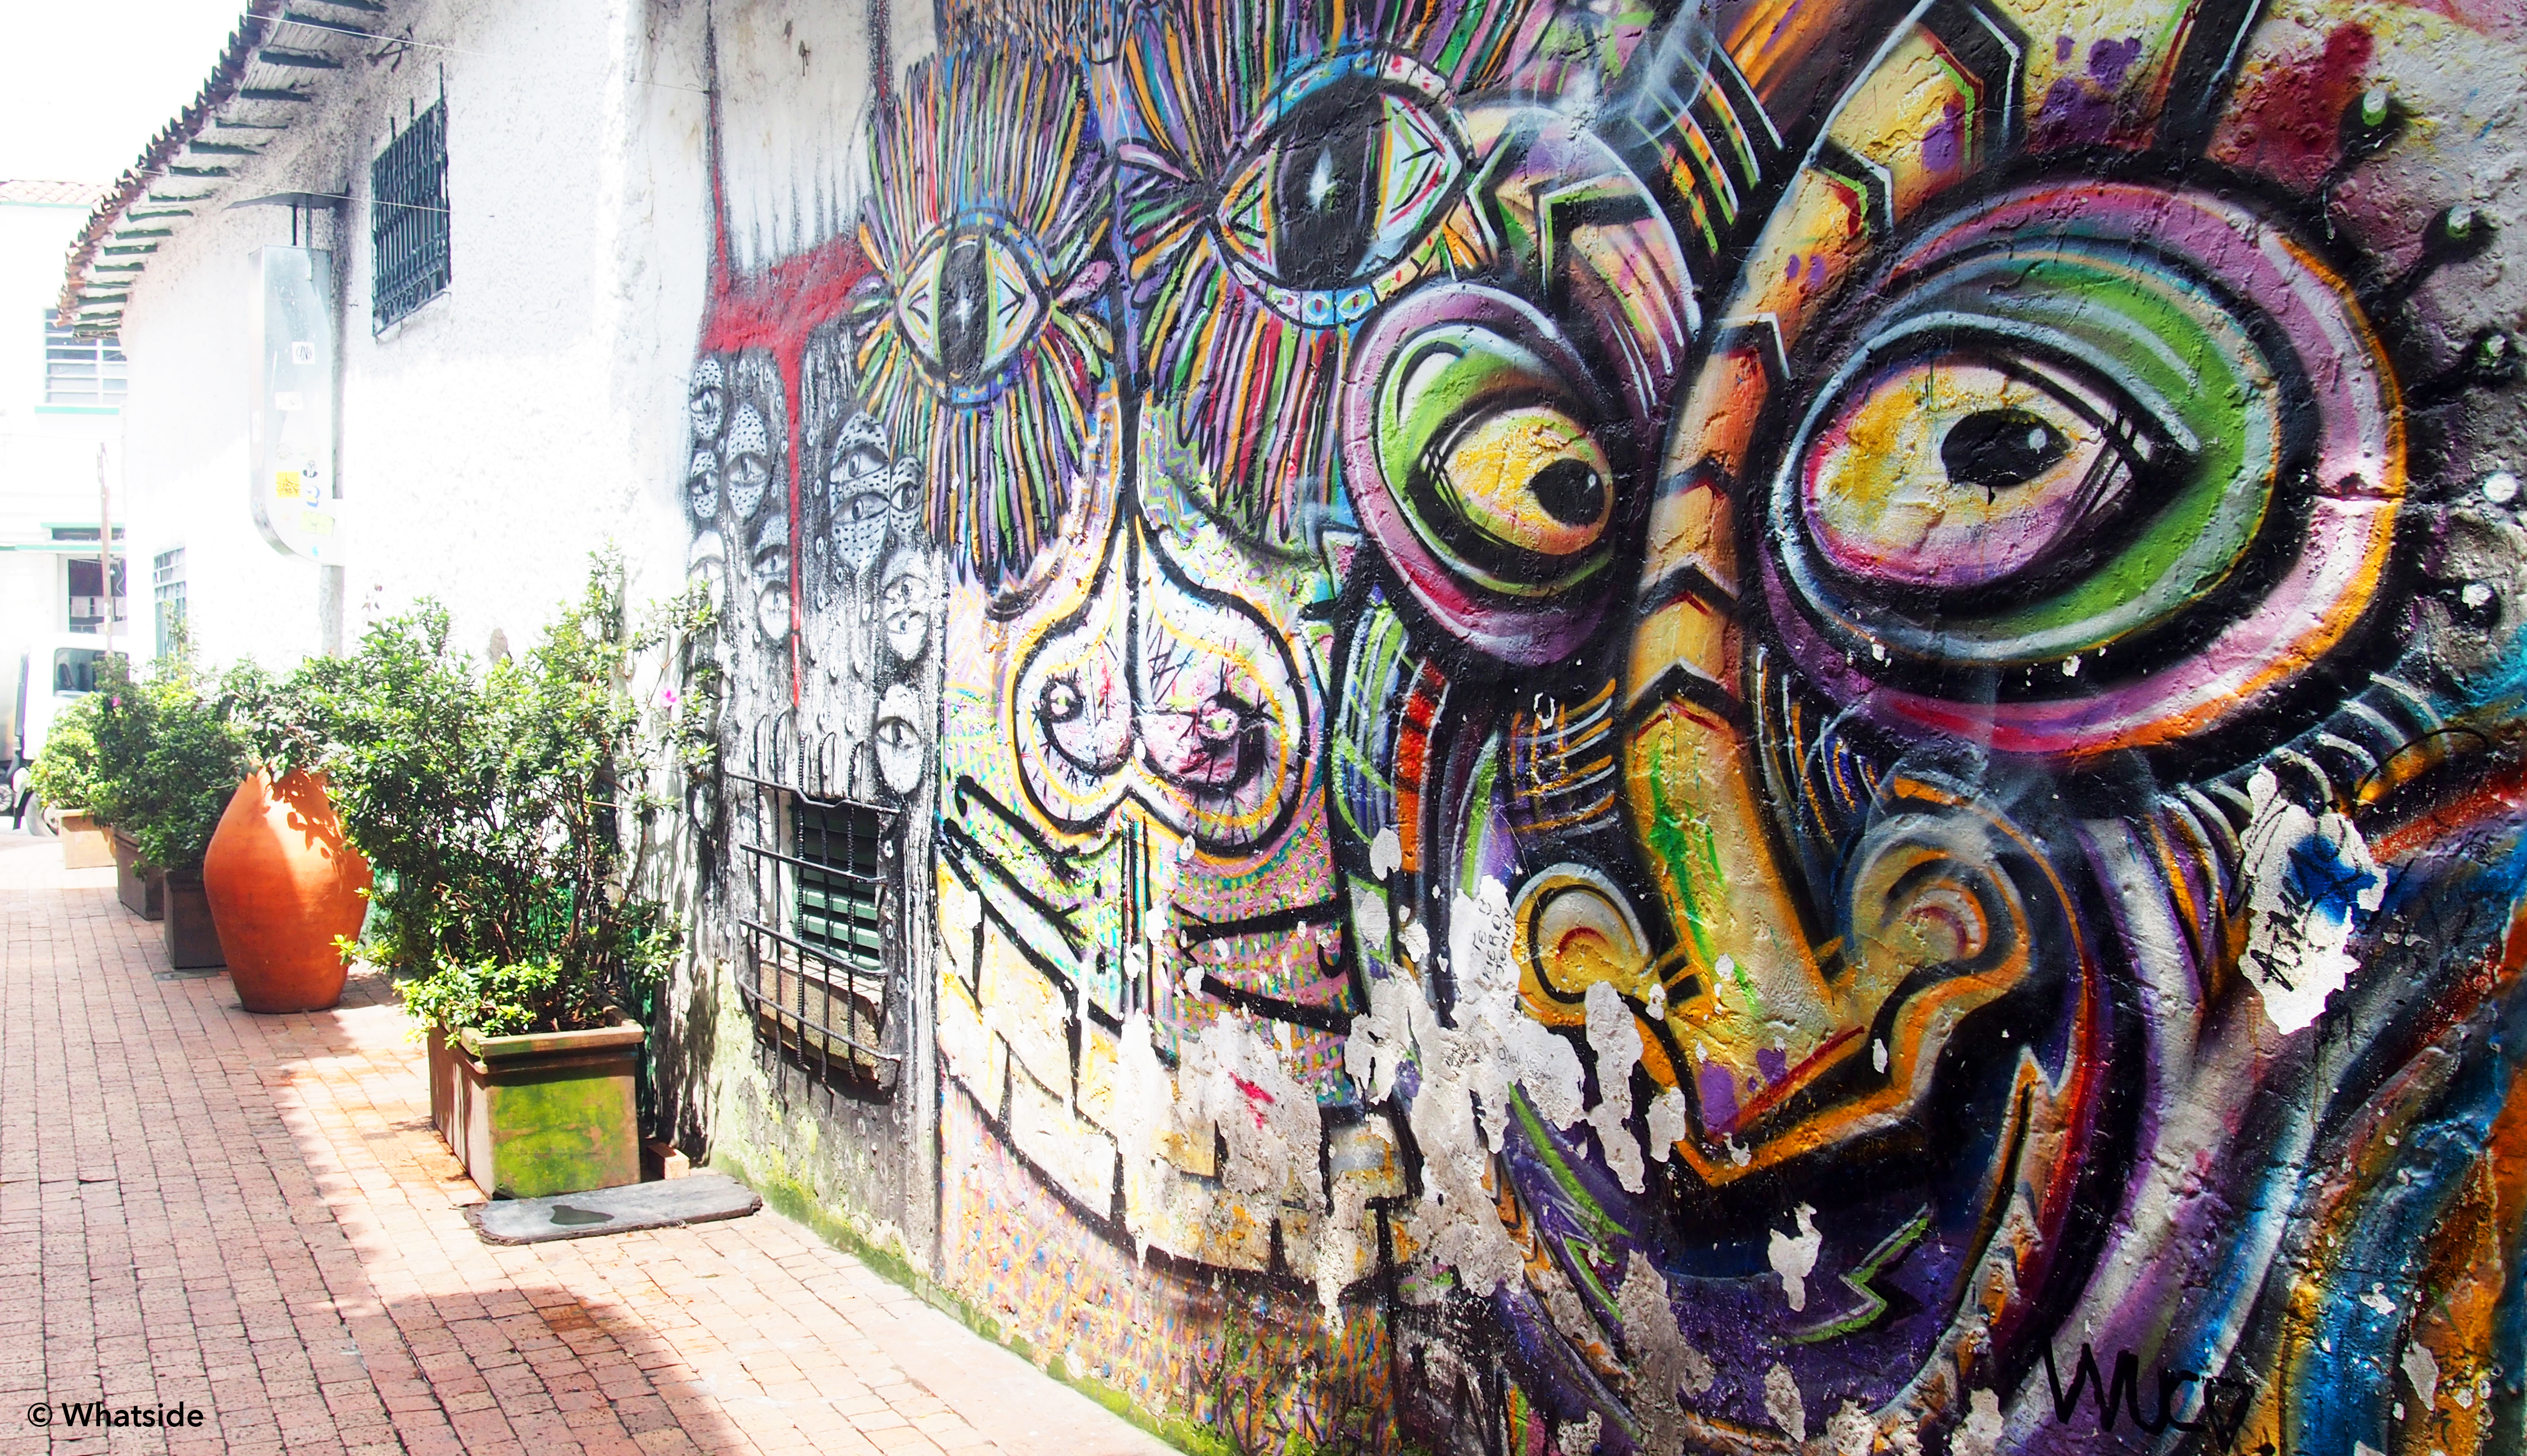 Les graffitis de Bogota